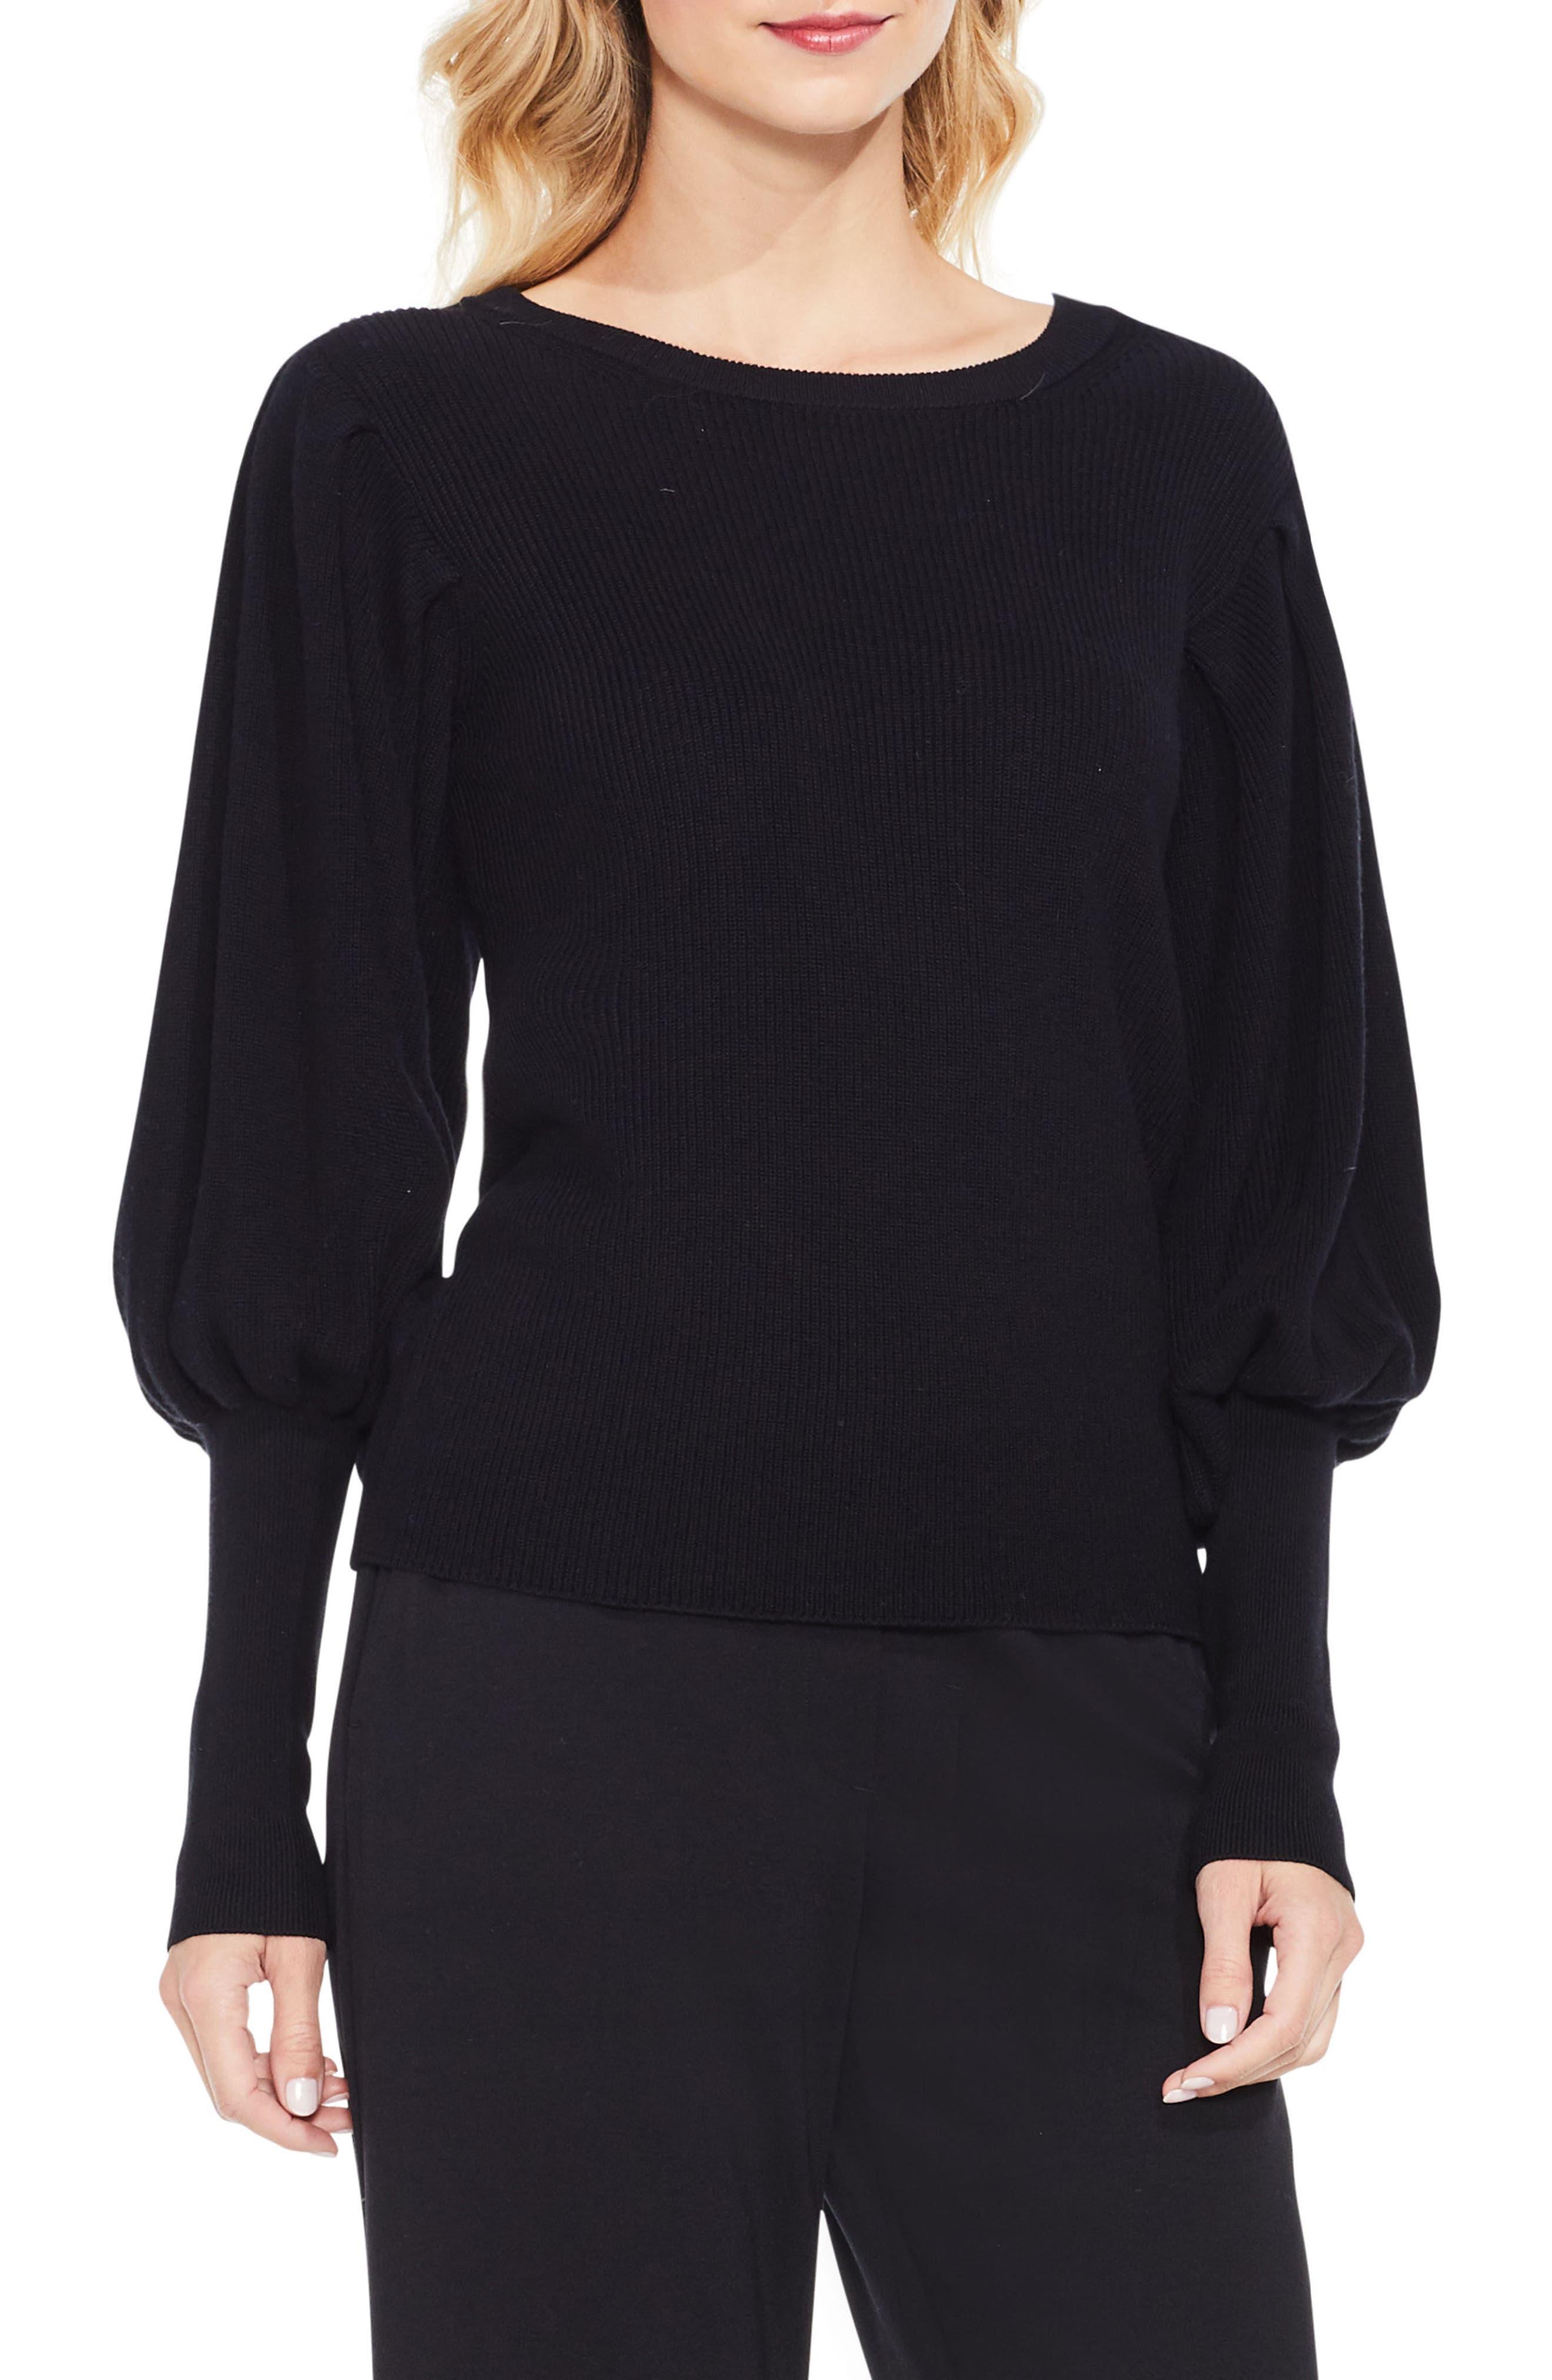 Vince Camuto Bubble Sleeve Sweater (Regular & Petite)